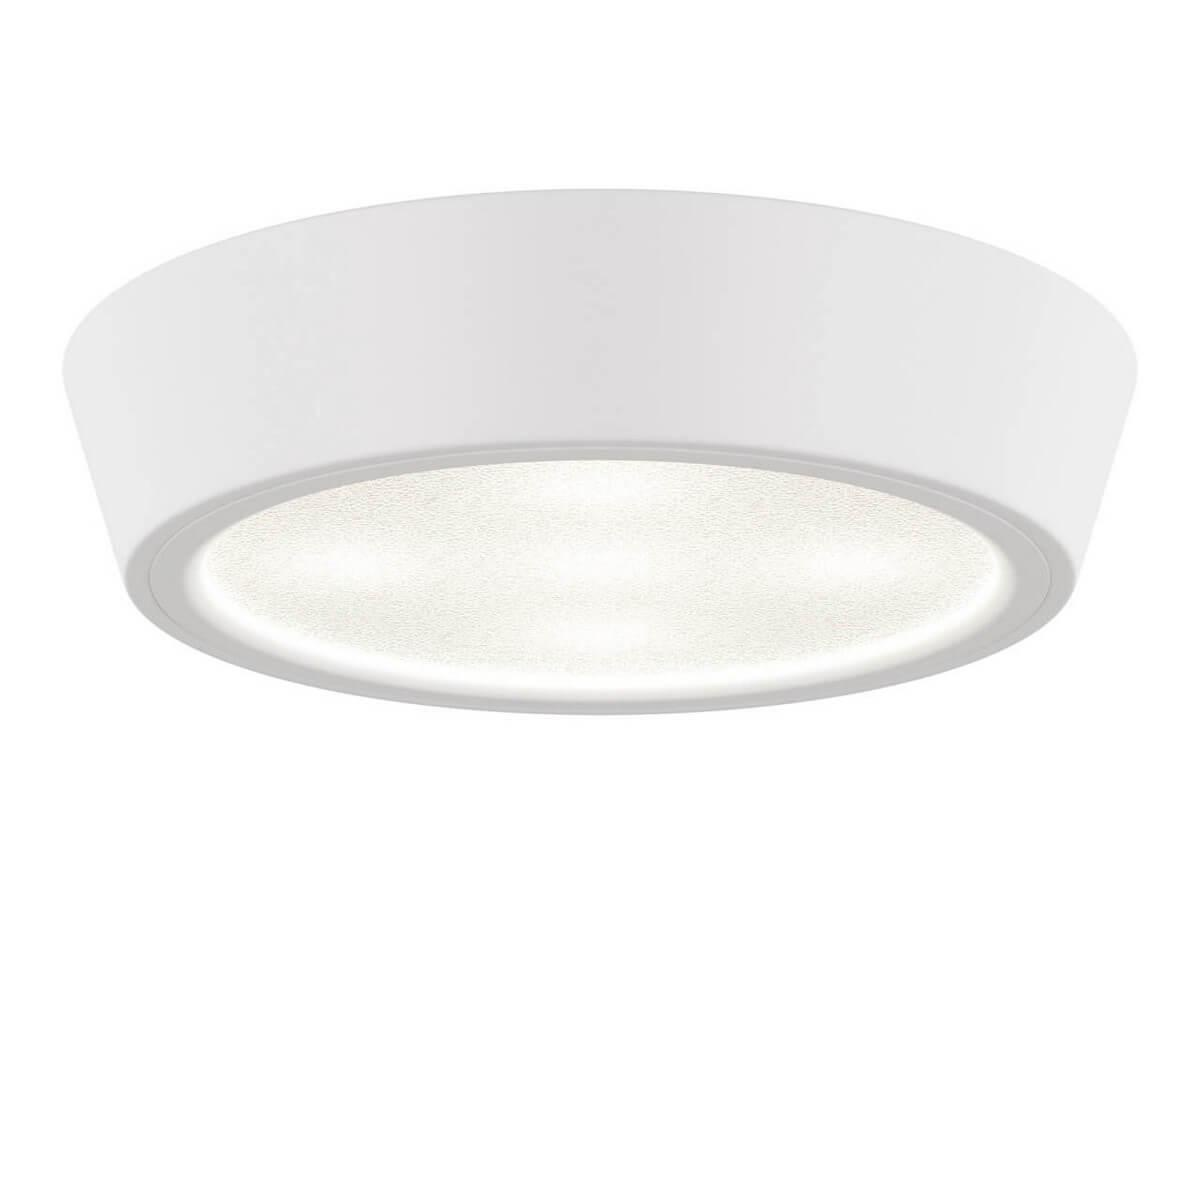 Накладной светильник Lightstar 214702, LED, 1 Вт lightstar 214316